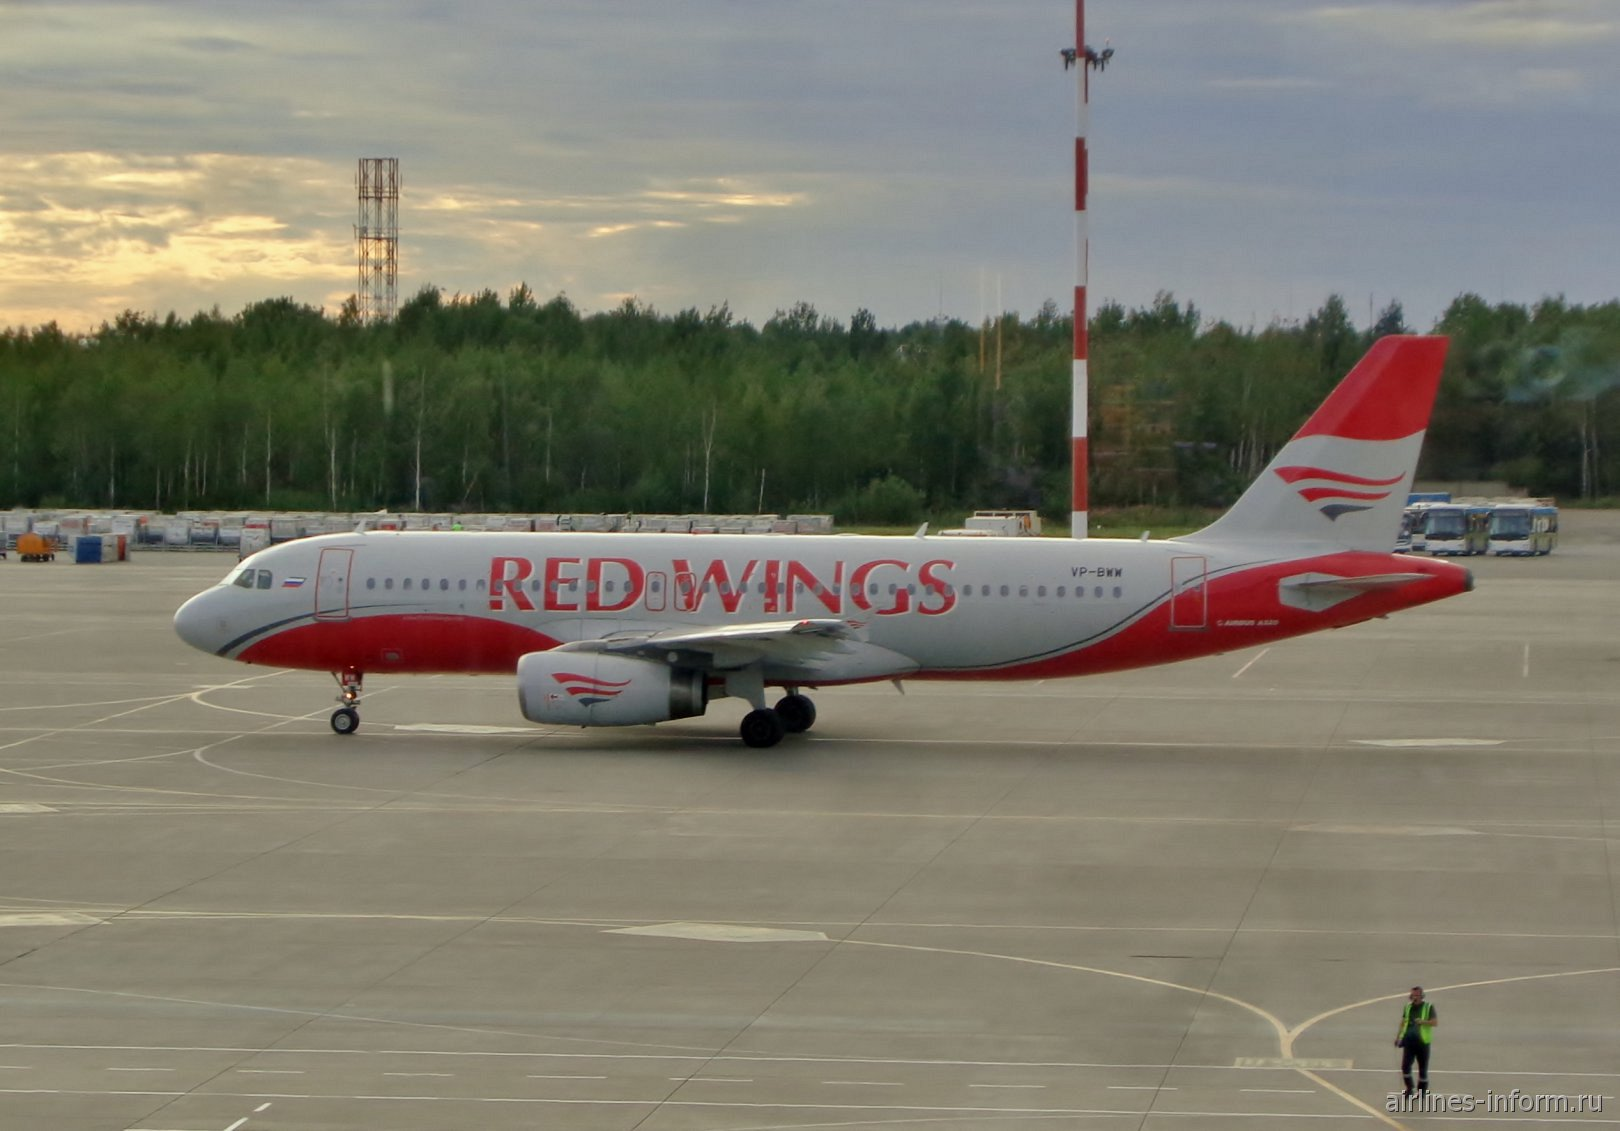 Самолет Airbus A320 авиакомпании Red Wings в аэропорту Санкт-Петербург Пулково